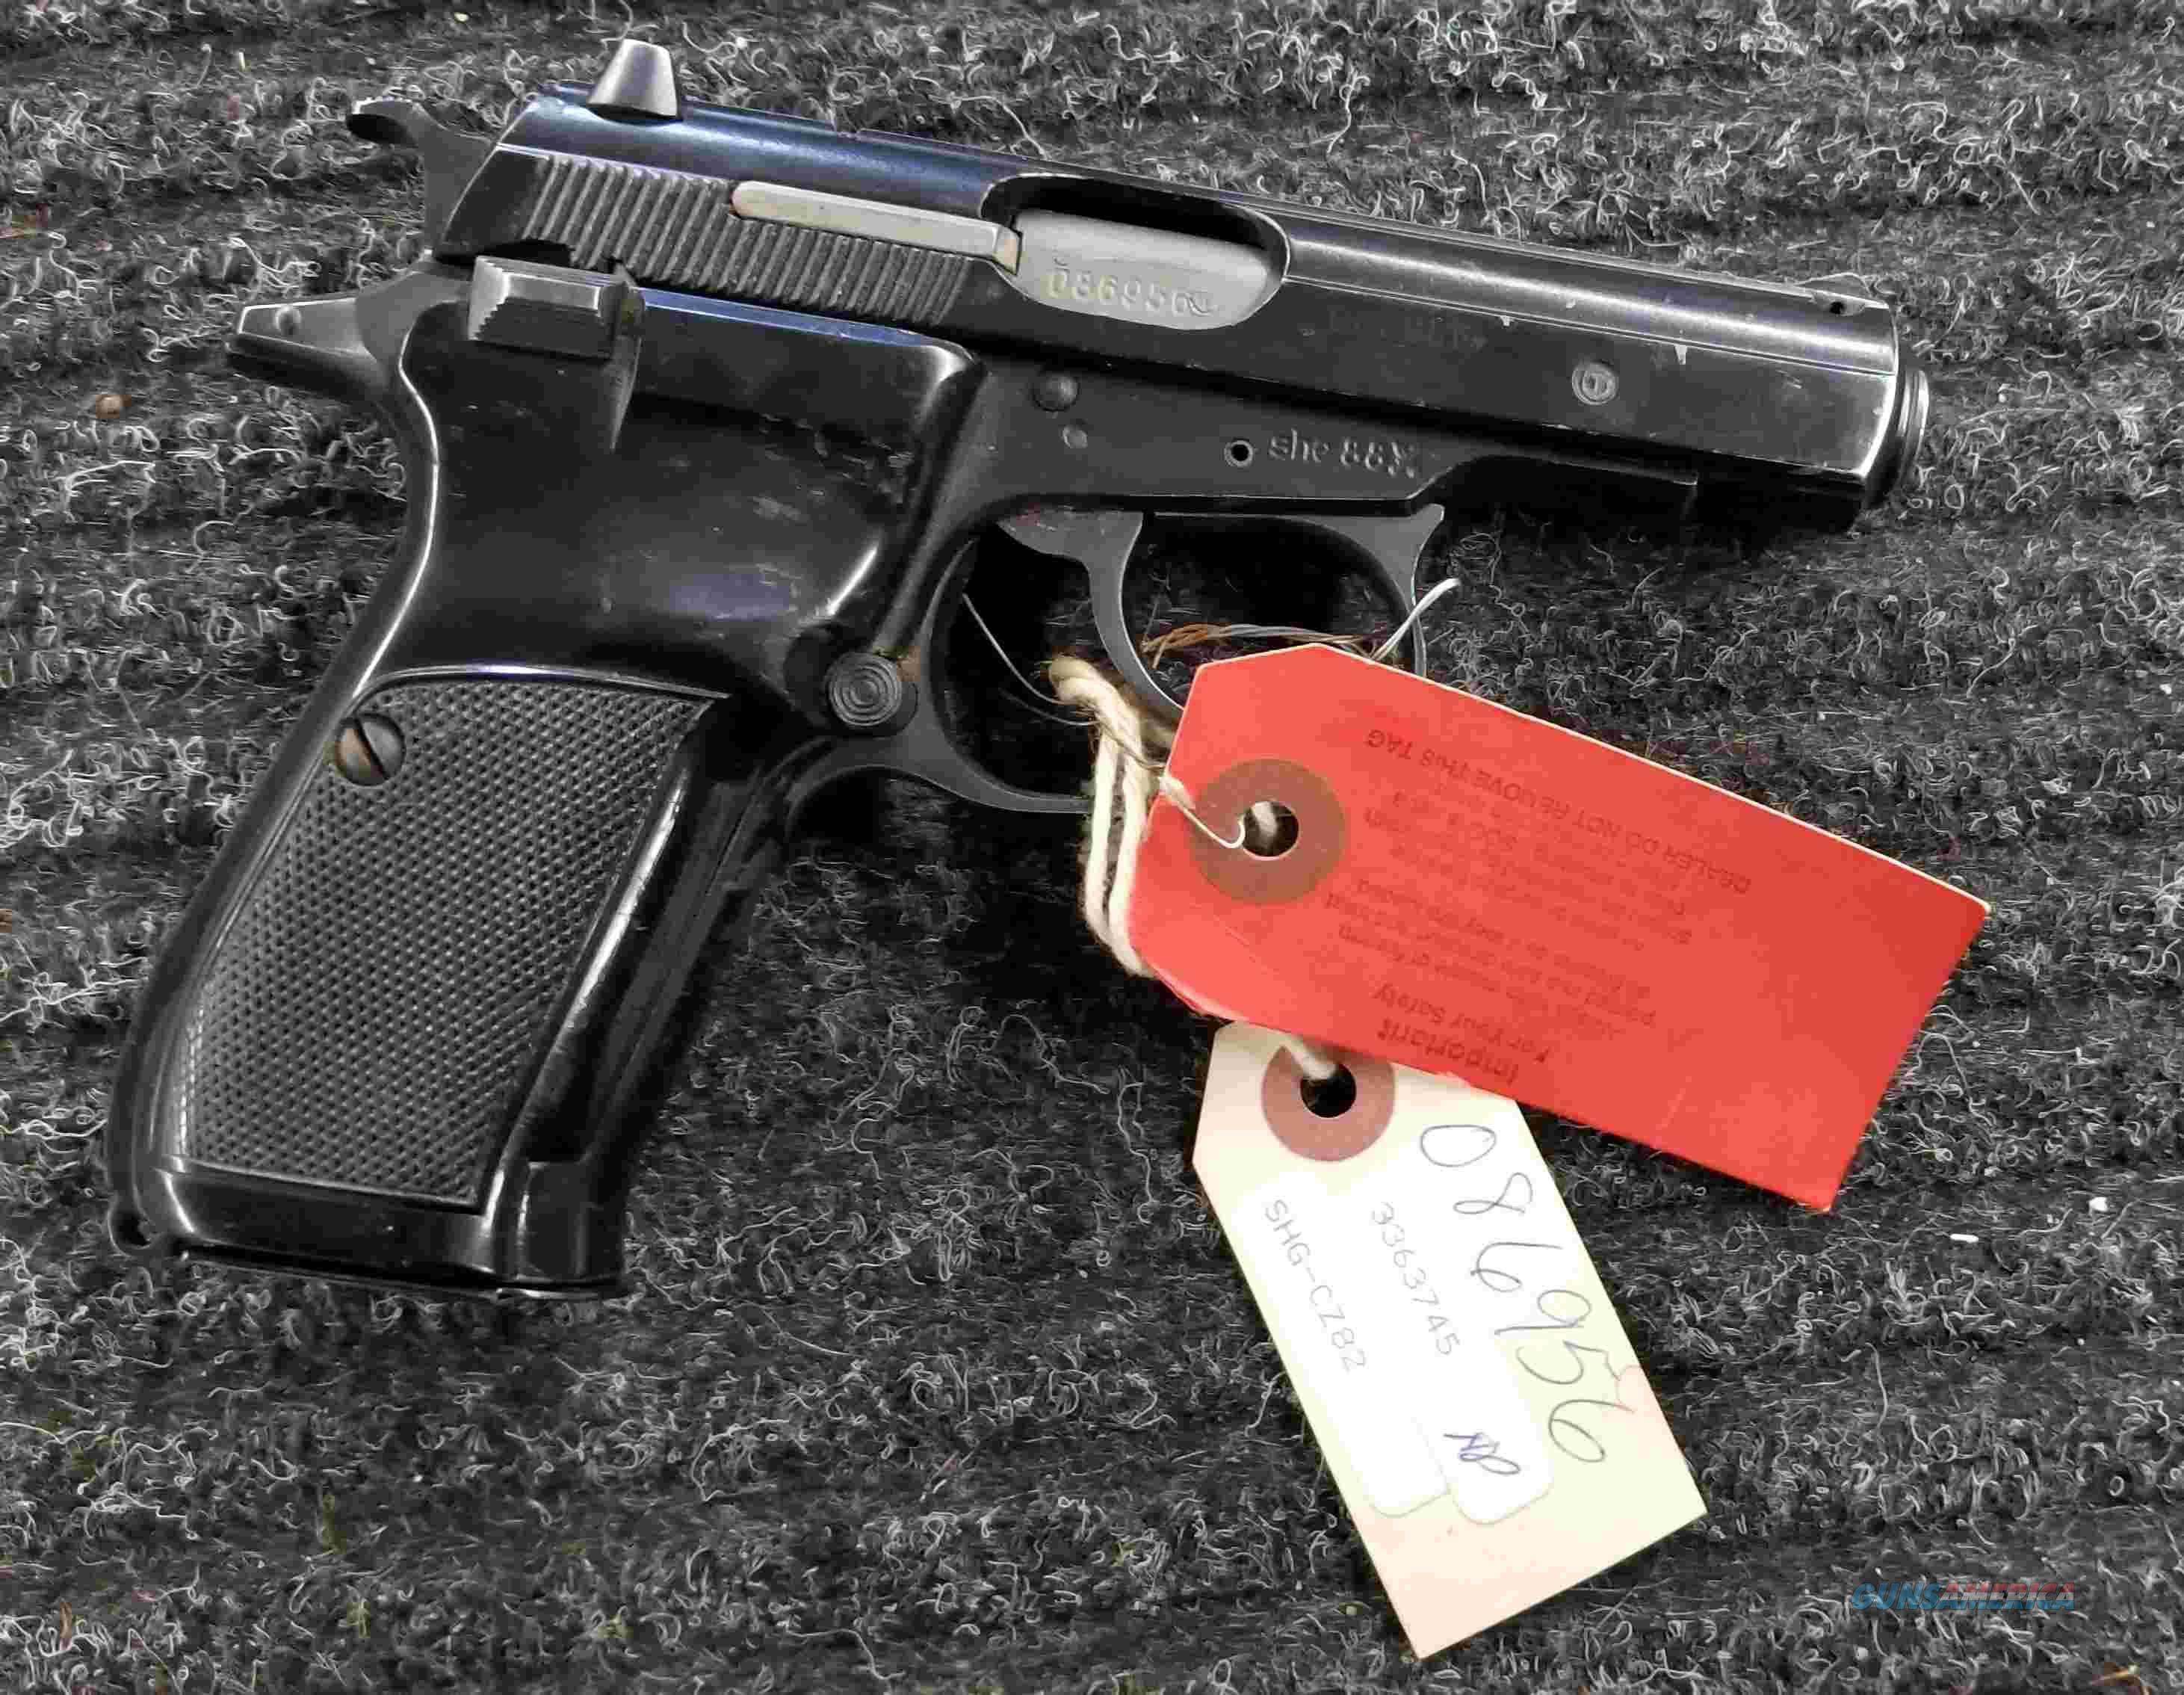 CZ 82 - 9x18 - Hoster & Extra Mag - Free Shipping !!!  Guns > Pistols > CZ Pistols